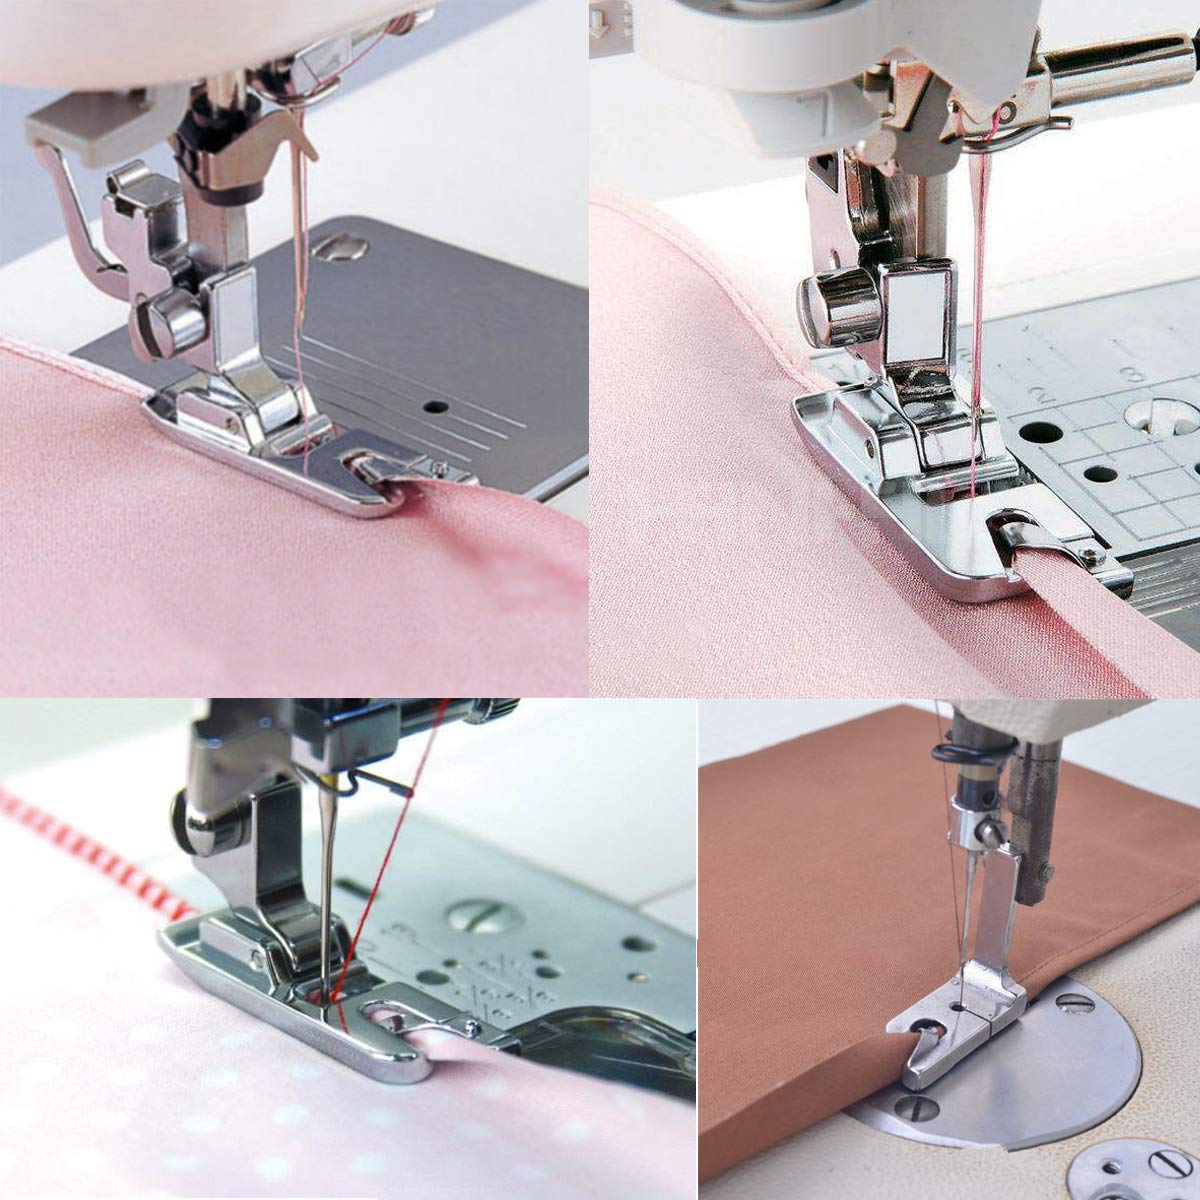 JXJH 3 Pieces Narrow Rolled Hem Sewing Machine Presser Foot Set N/ähmaschinen-Kit N/ähf/ü/ße Ersatzteile Zubeh/ör Geeignet f/ür Haushalts-Multifunktionsn/ähmaschinen 3 mm, 4 mm and 6 mm